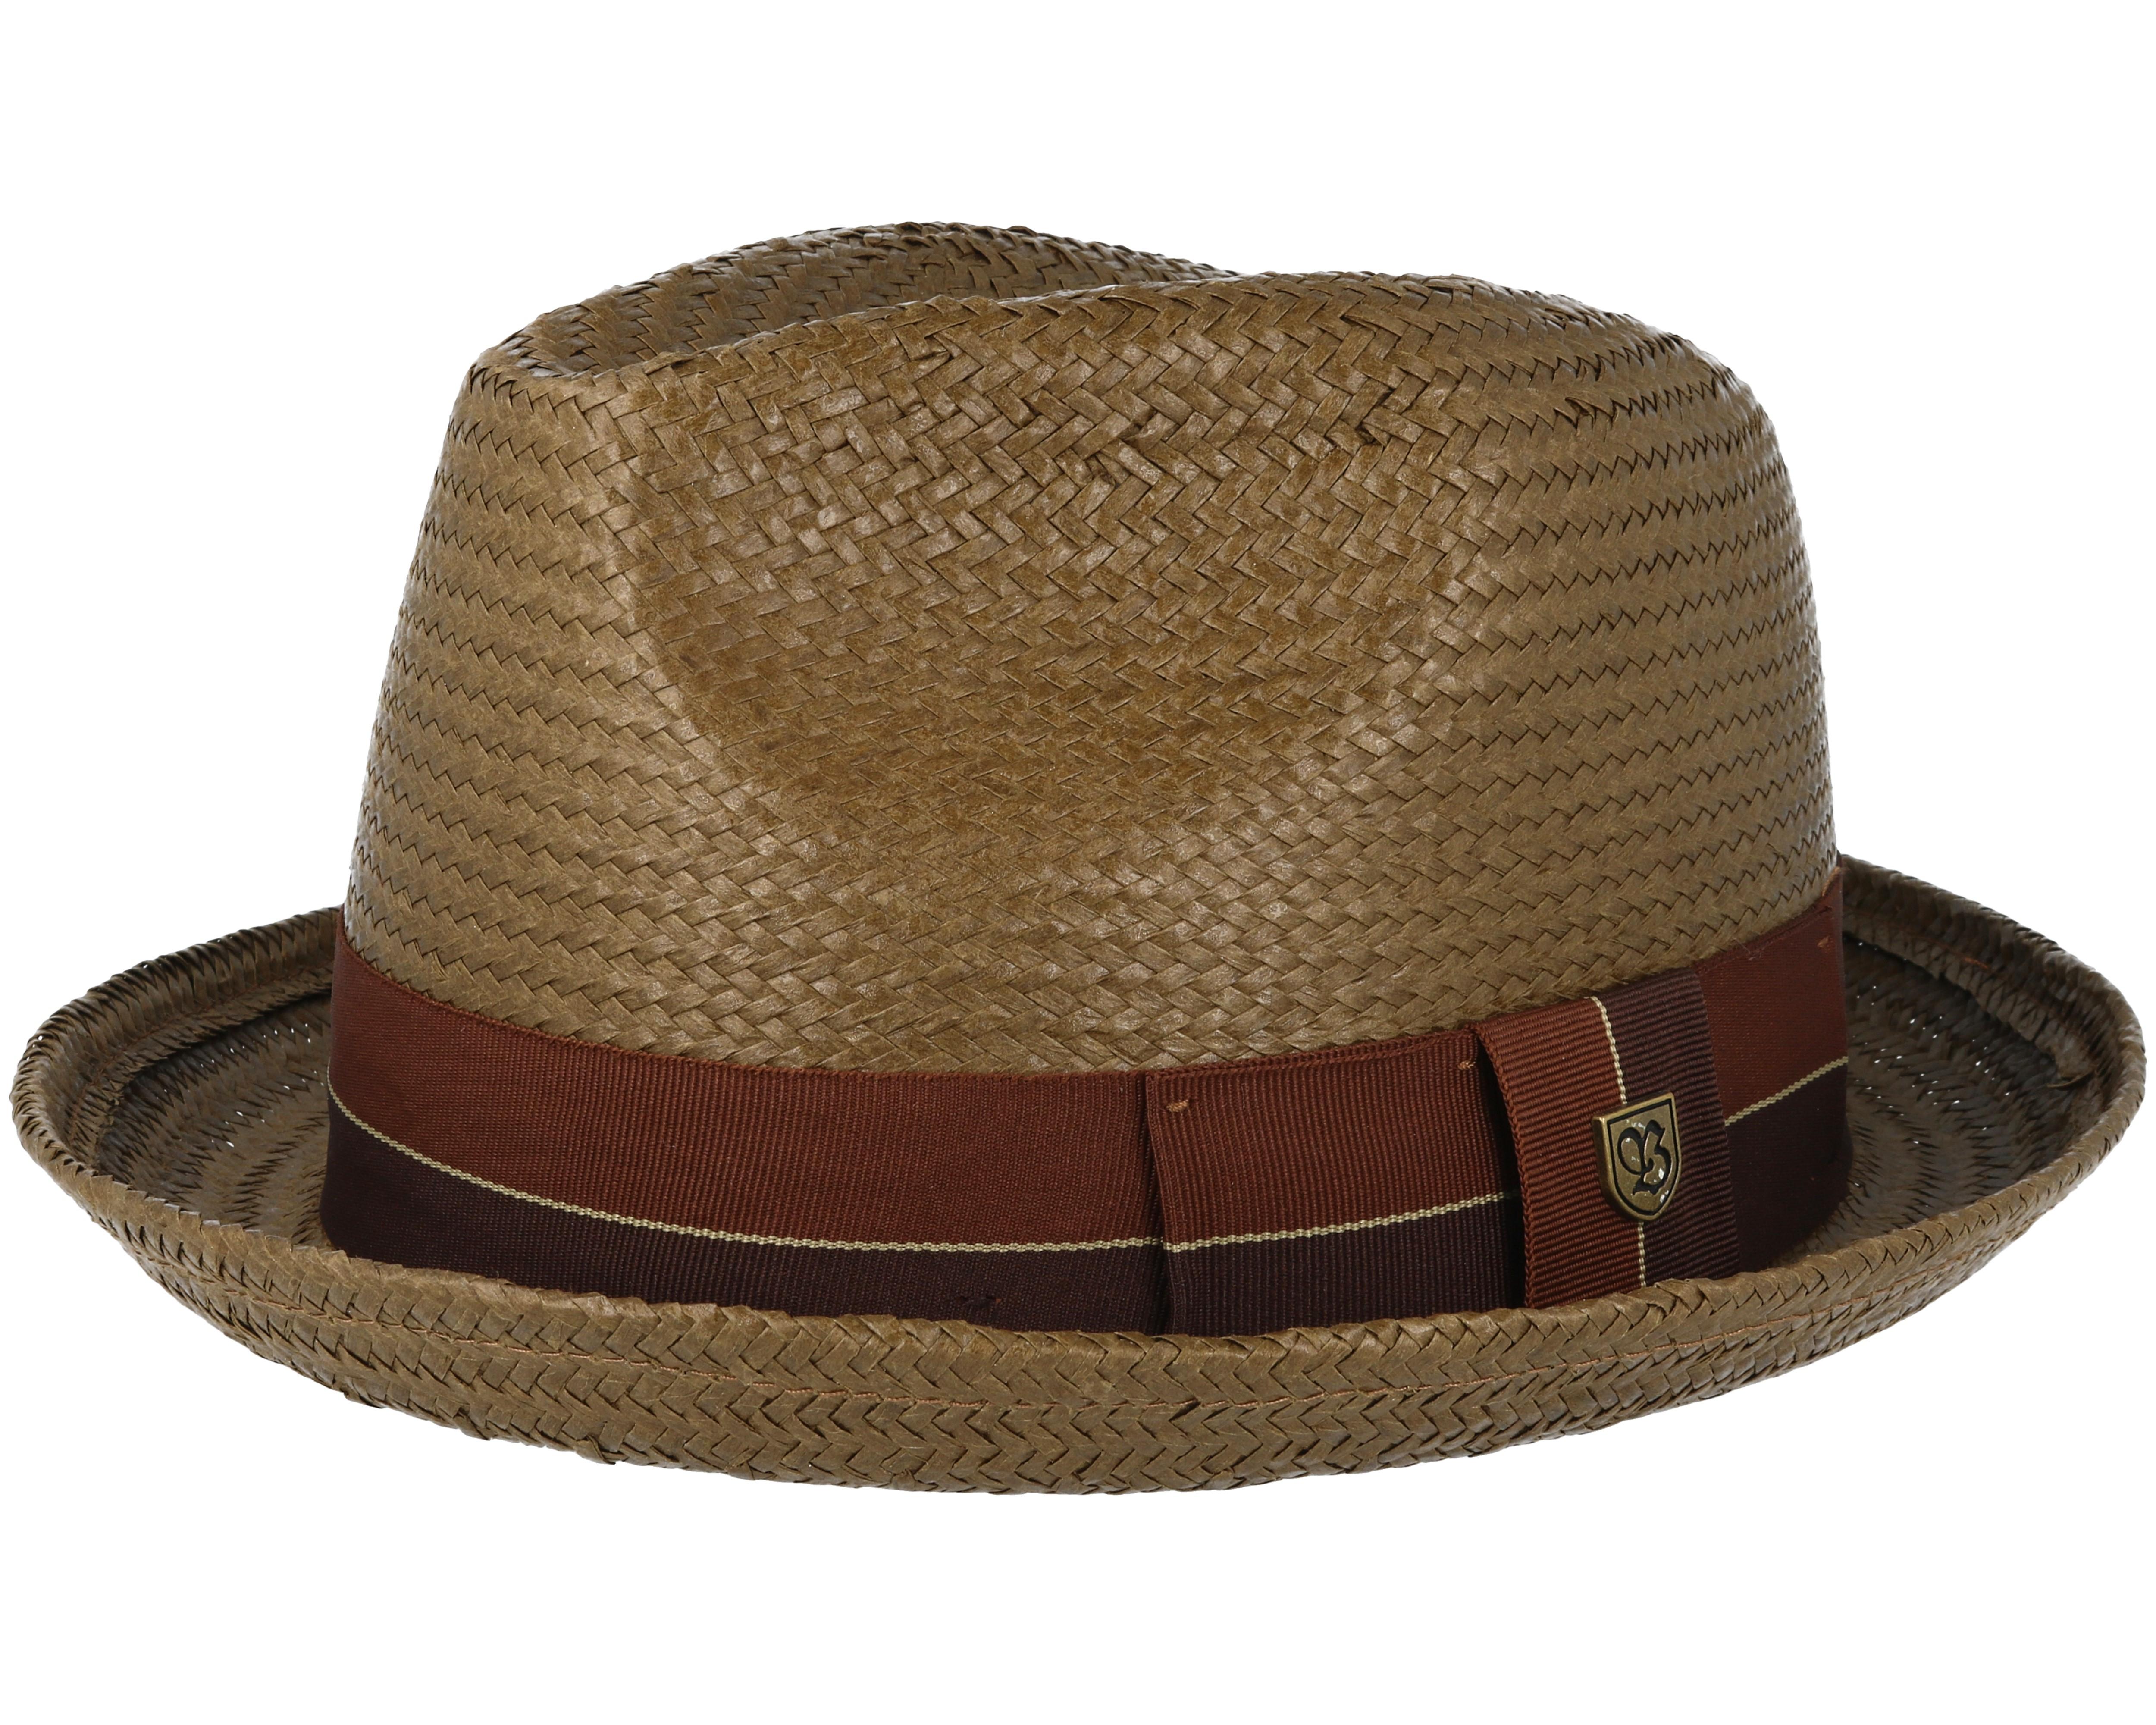 Castor Brown Fedora - Brixton - chapeau   Hatstore.fr 354950cf04f